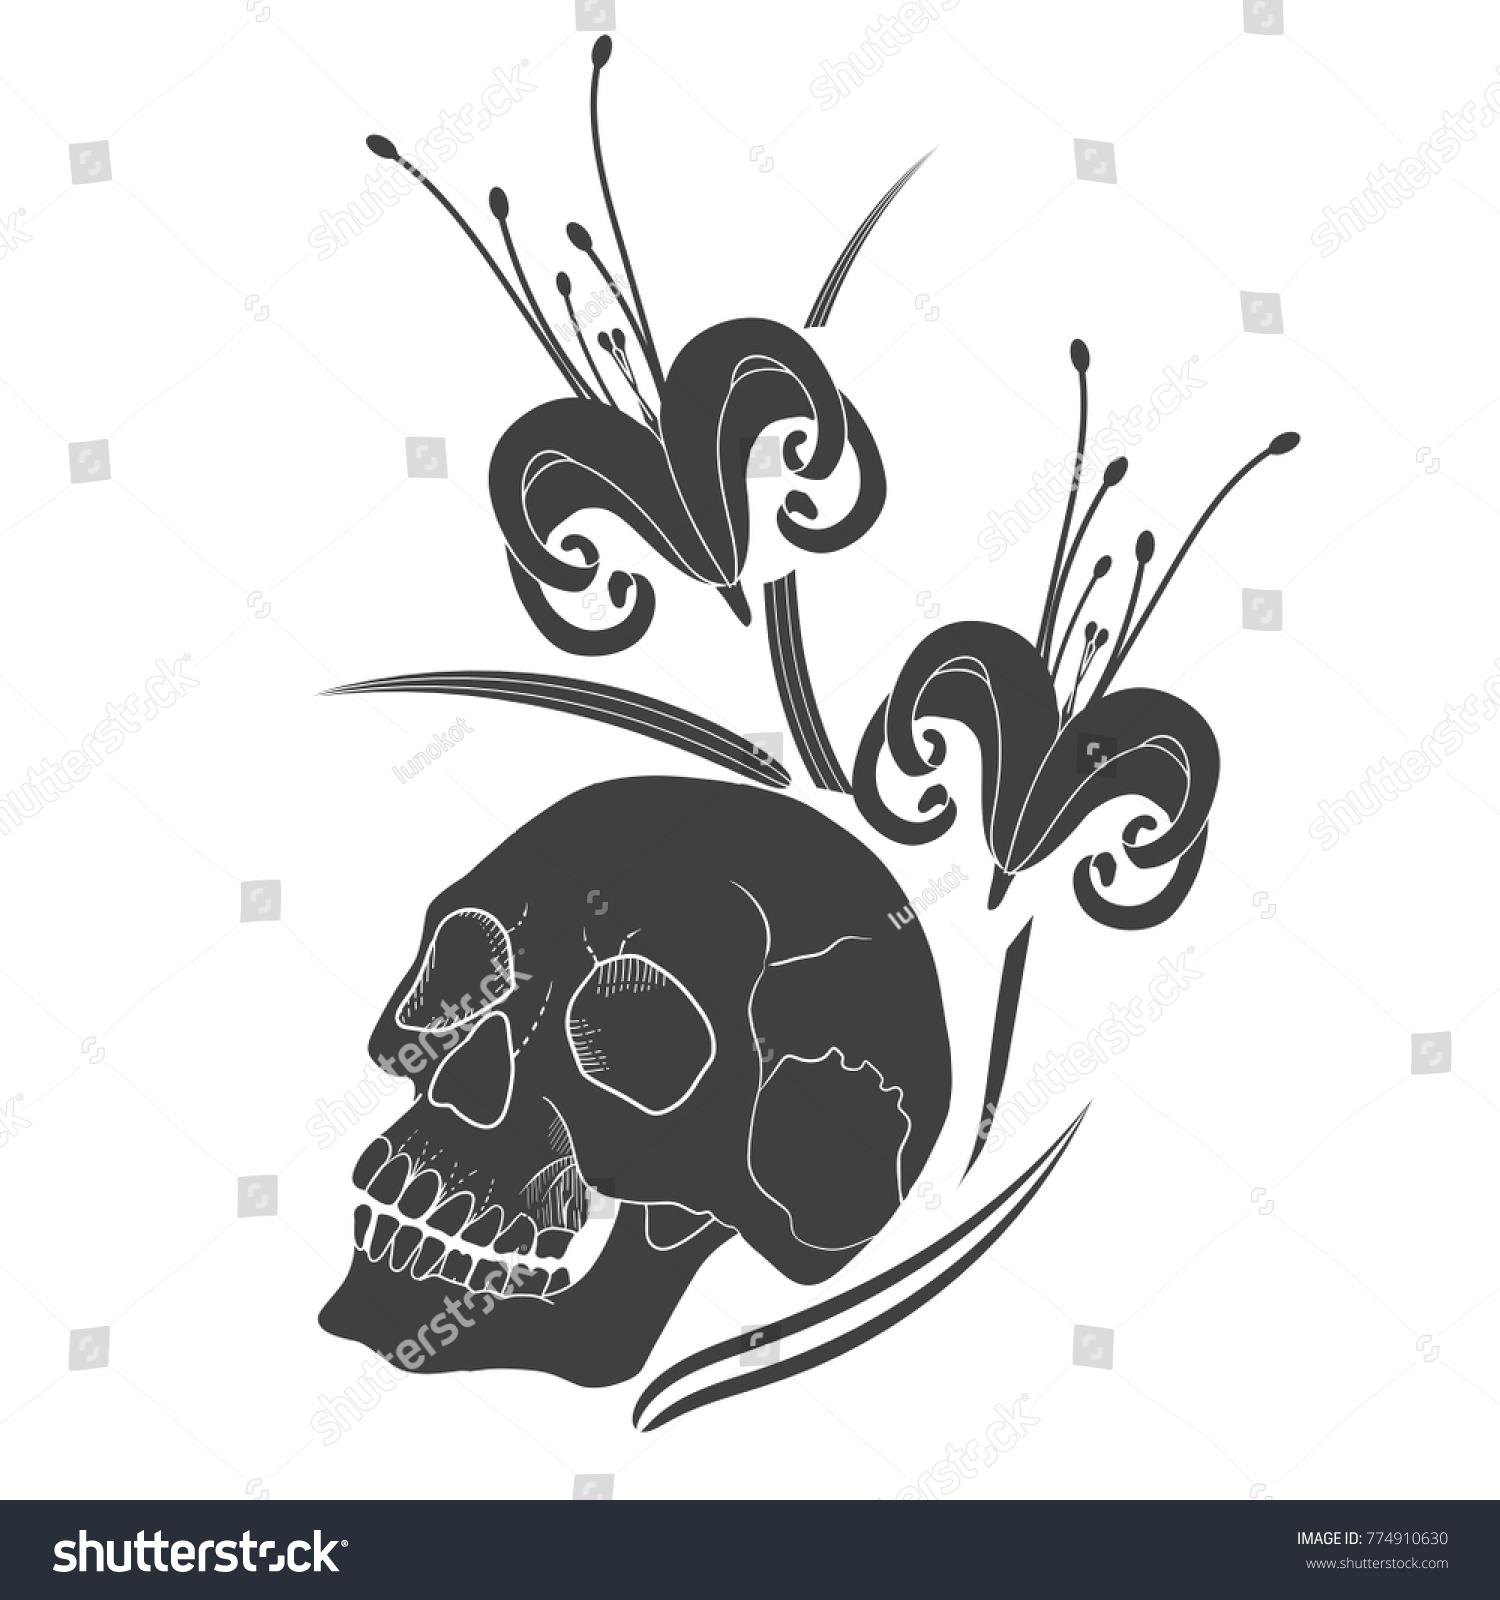 Human Skull Lily Flower Tattoo Vector Stock Vector Royalty Free